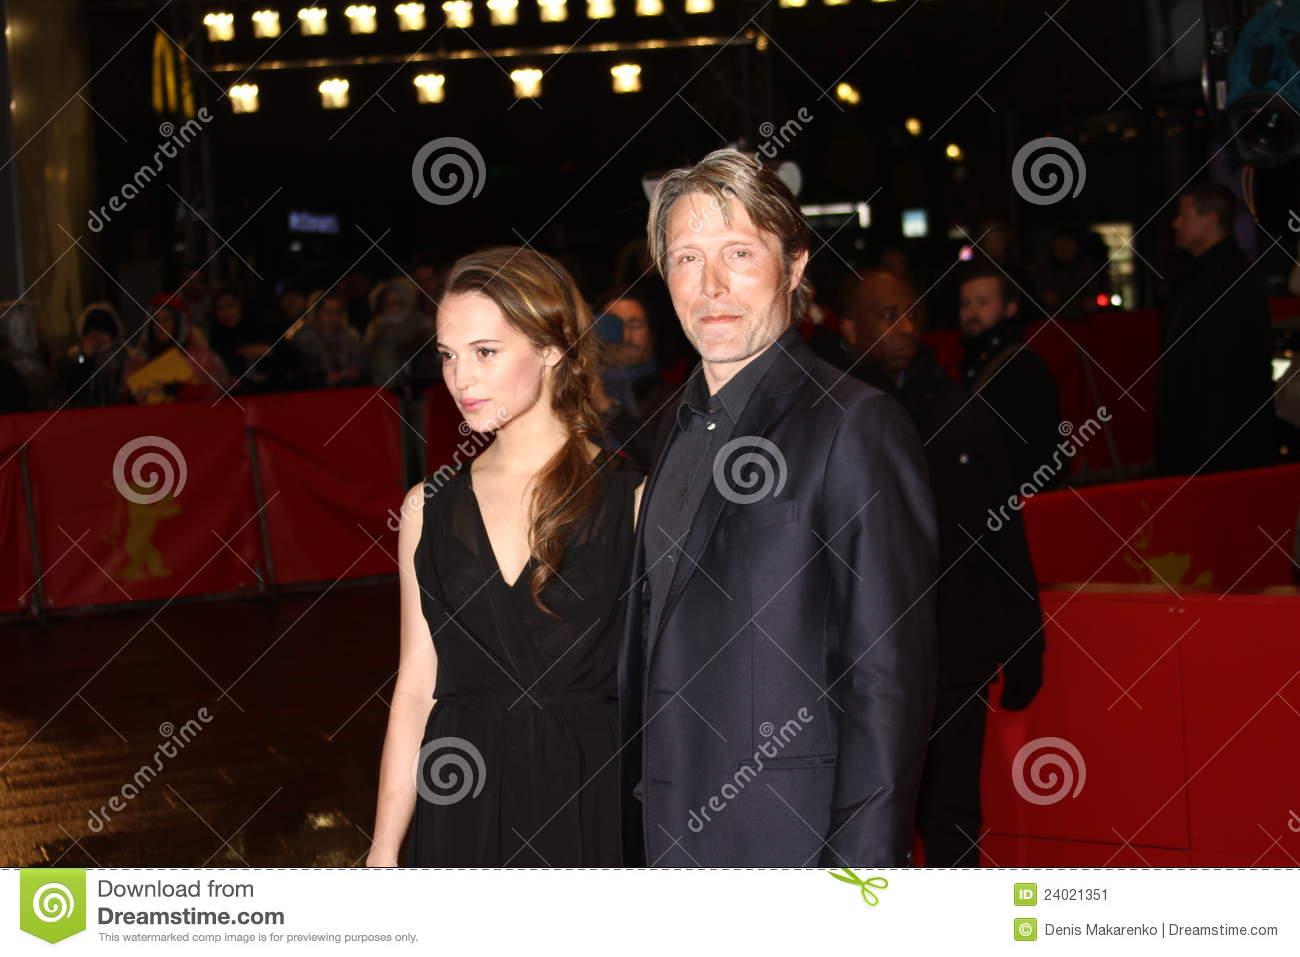 Alicia Vikander and Mads Mikkelsen